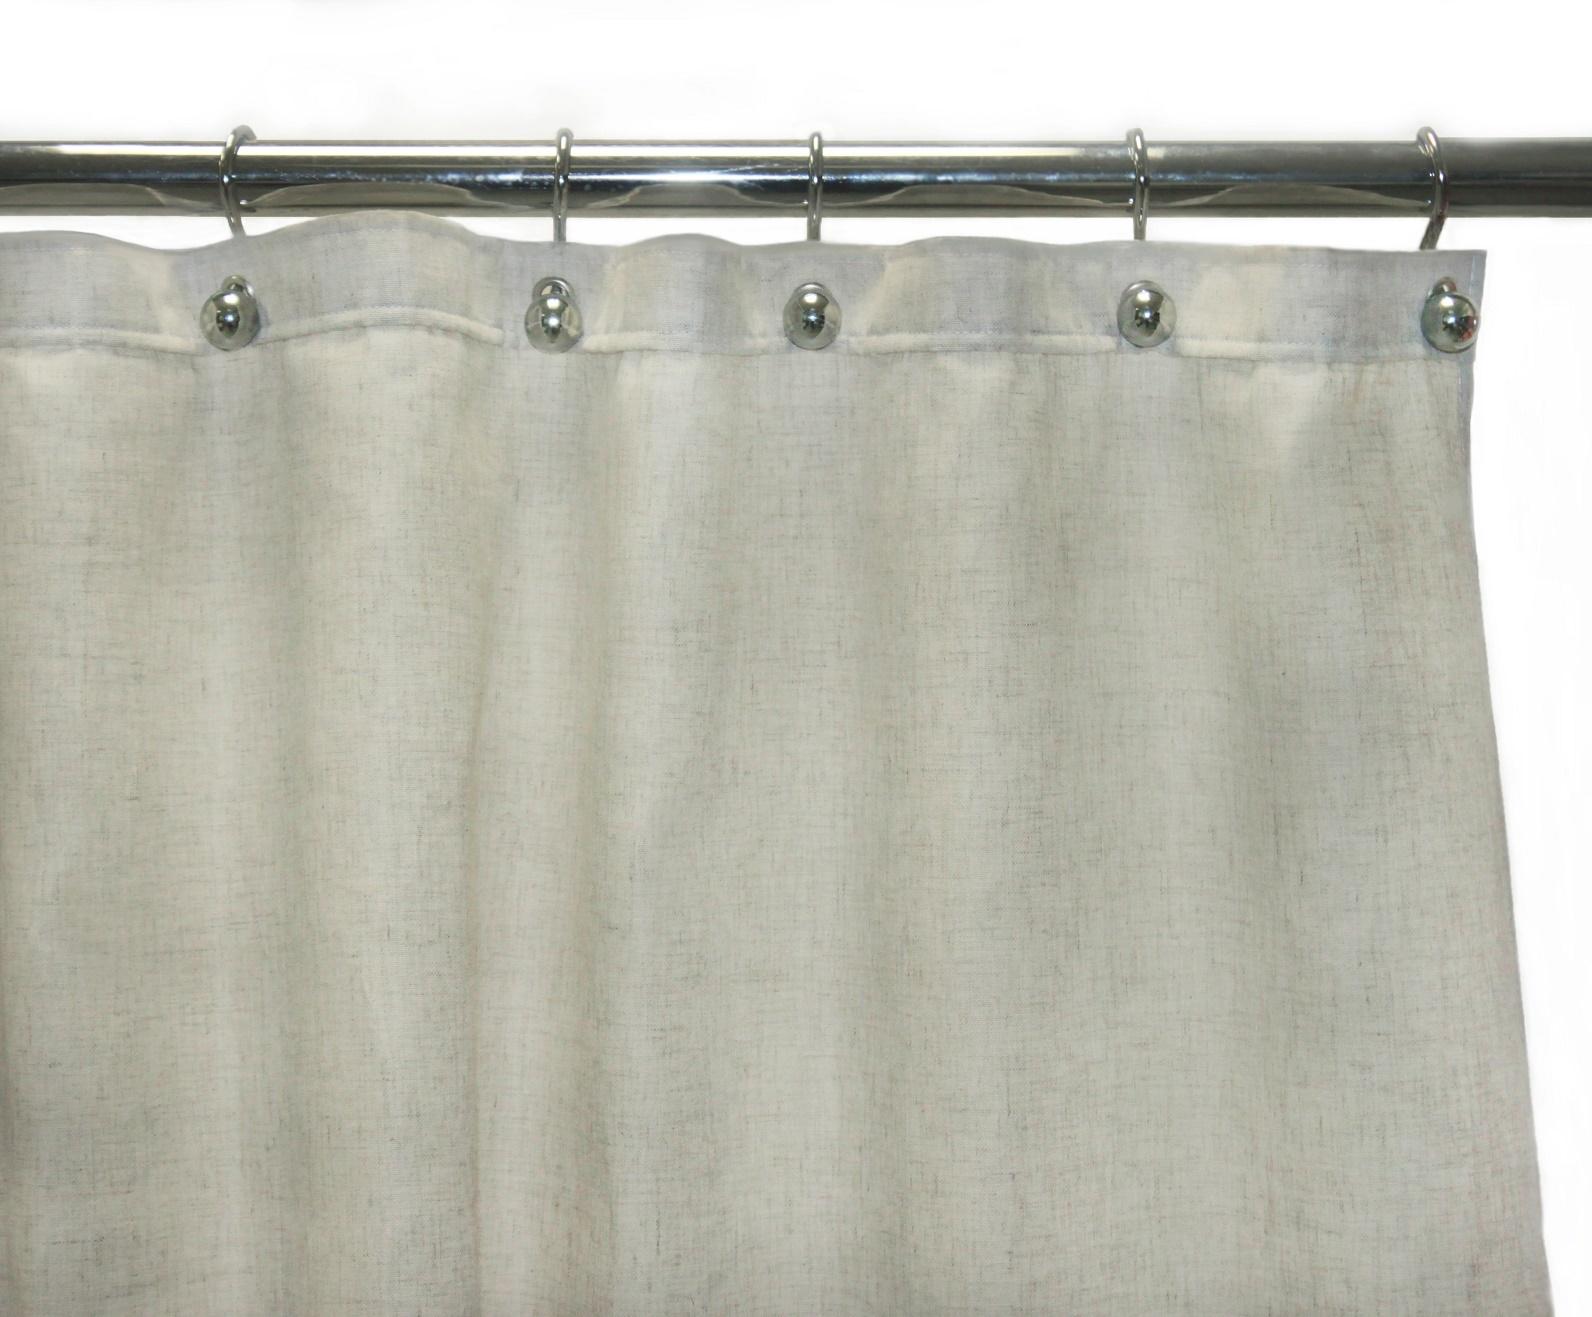 Шторки для ванной Шторка для ванной 180х200 Arti-Deco Osaka C. Two elitnaya-shtorka-dlya-vannoy-osaka-c-two-ot-arti-deco-ispaniya.jpg